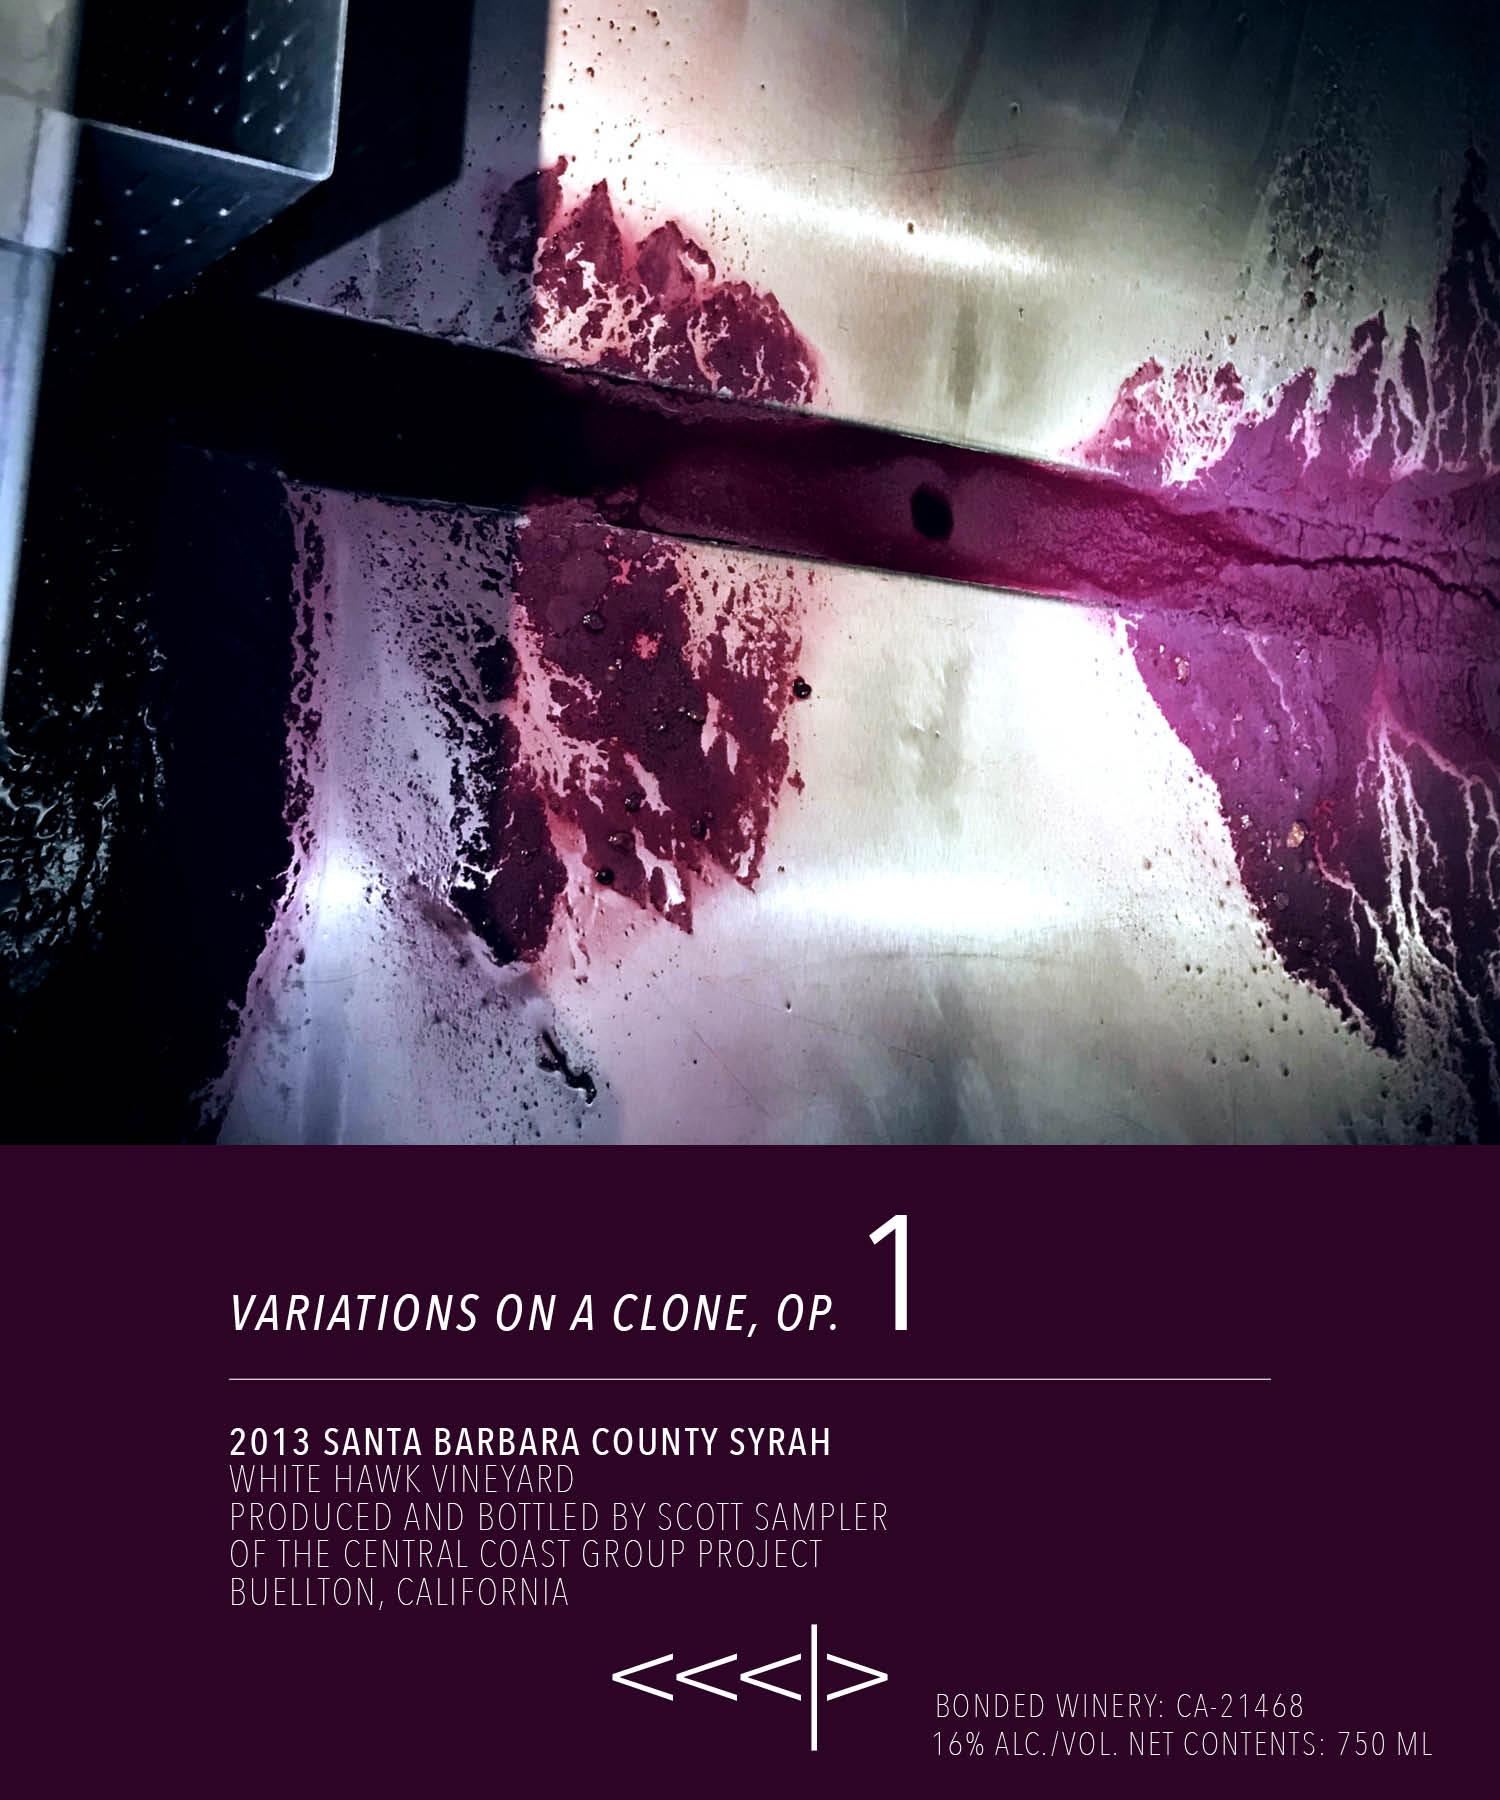 "CCGP 2013 ""VARIATIONS ON A CLONE, OP. 1, 174 & 877"" SYRAH - WHITE HAWK VINEYARD - SANTA BARBARA COUNTY"